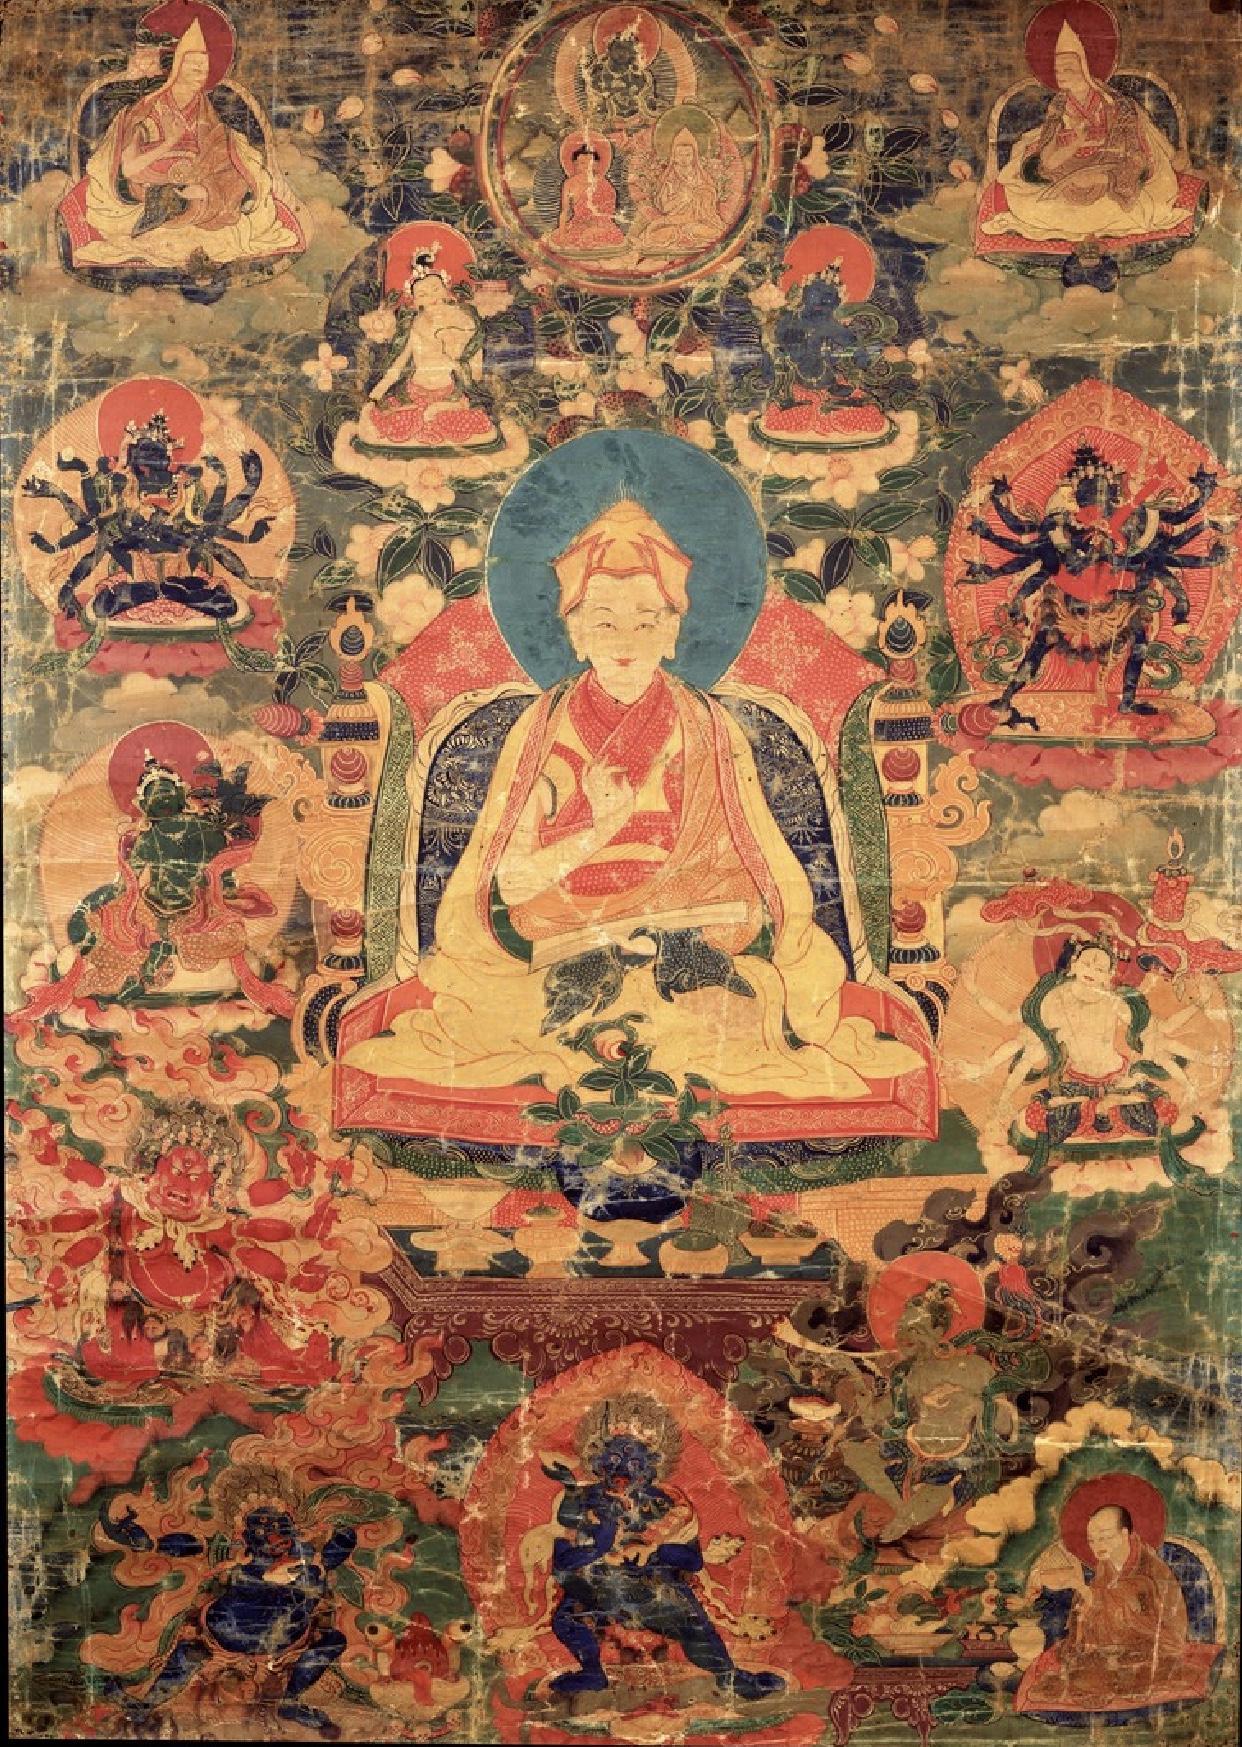 Panchen LosangChökyi Gyaltsen. (Photo© 2018 Himalayan ArtResources Inc. Photographed Image Copyright © 2004 Rubin Museum ofArt)